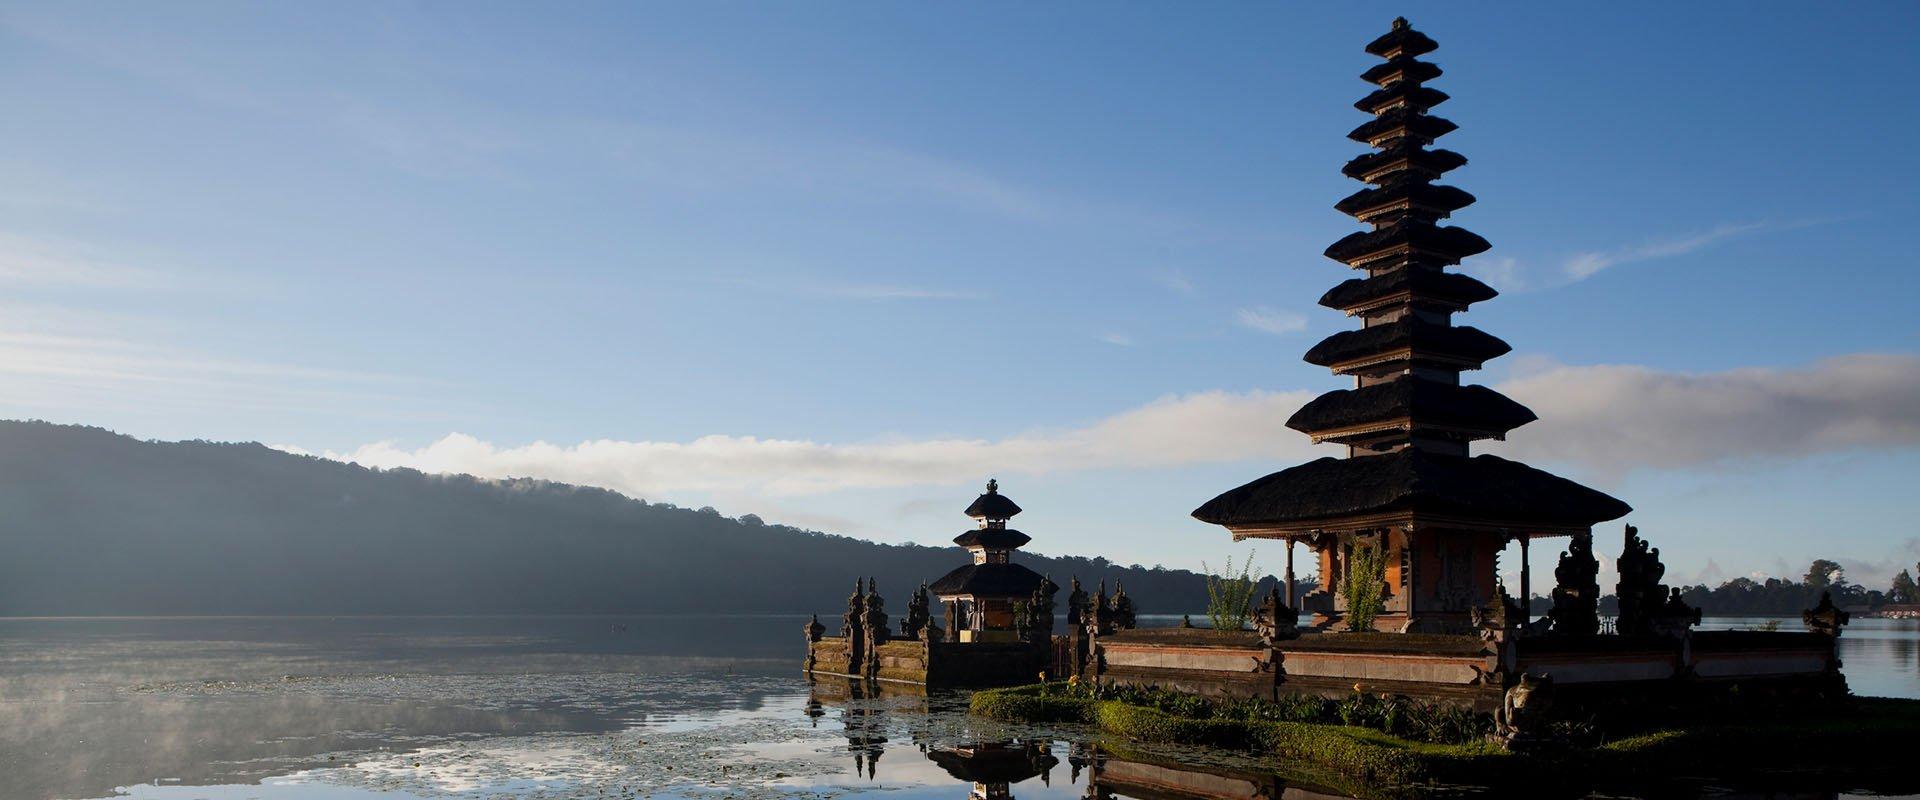 Bali Hindu New Year 2020 and 2021 - PublicHolidays.co.id